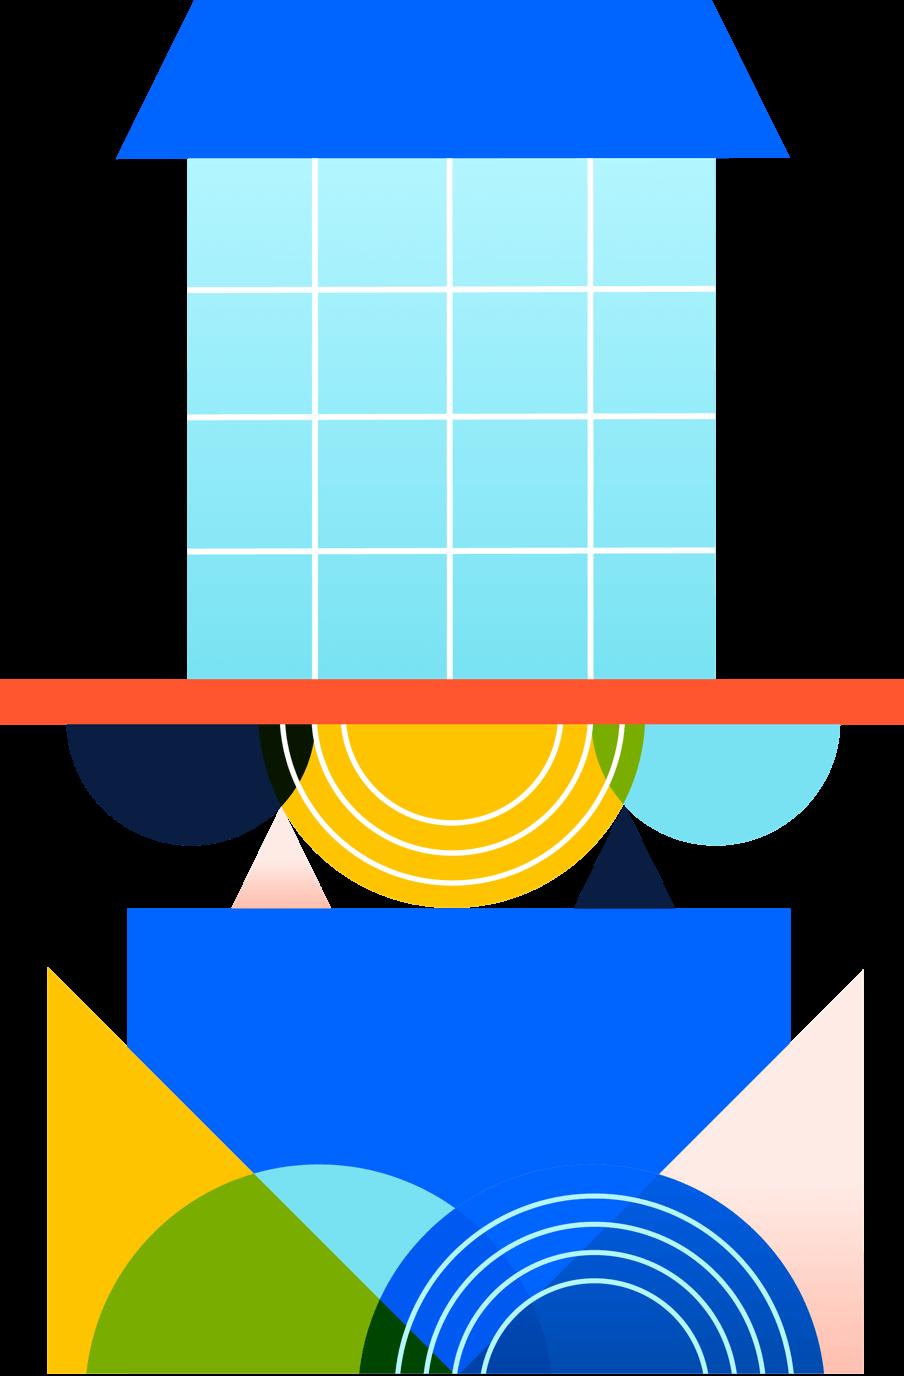 Illustration of shapes stacking